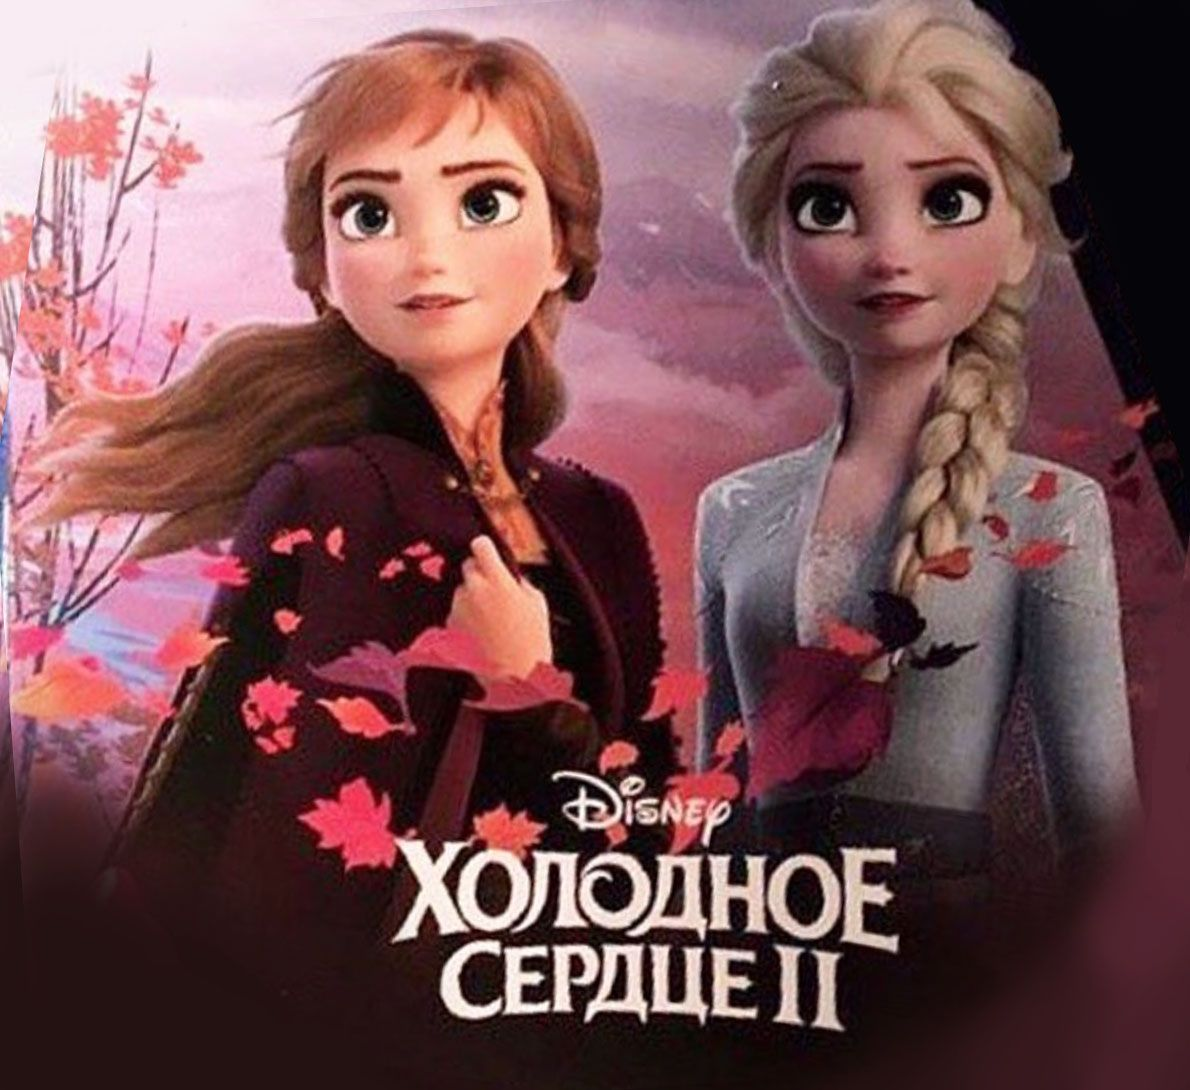 Frozen 2 2019 Top Upcoming Disney Movie Frozen Frozen2 Disney Movie Animated Elsa 2019 Hollywood Quotes Disney Upcoming Disney Movies Disney Frozen